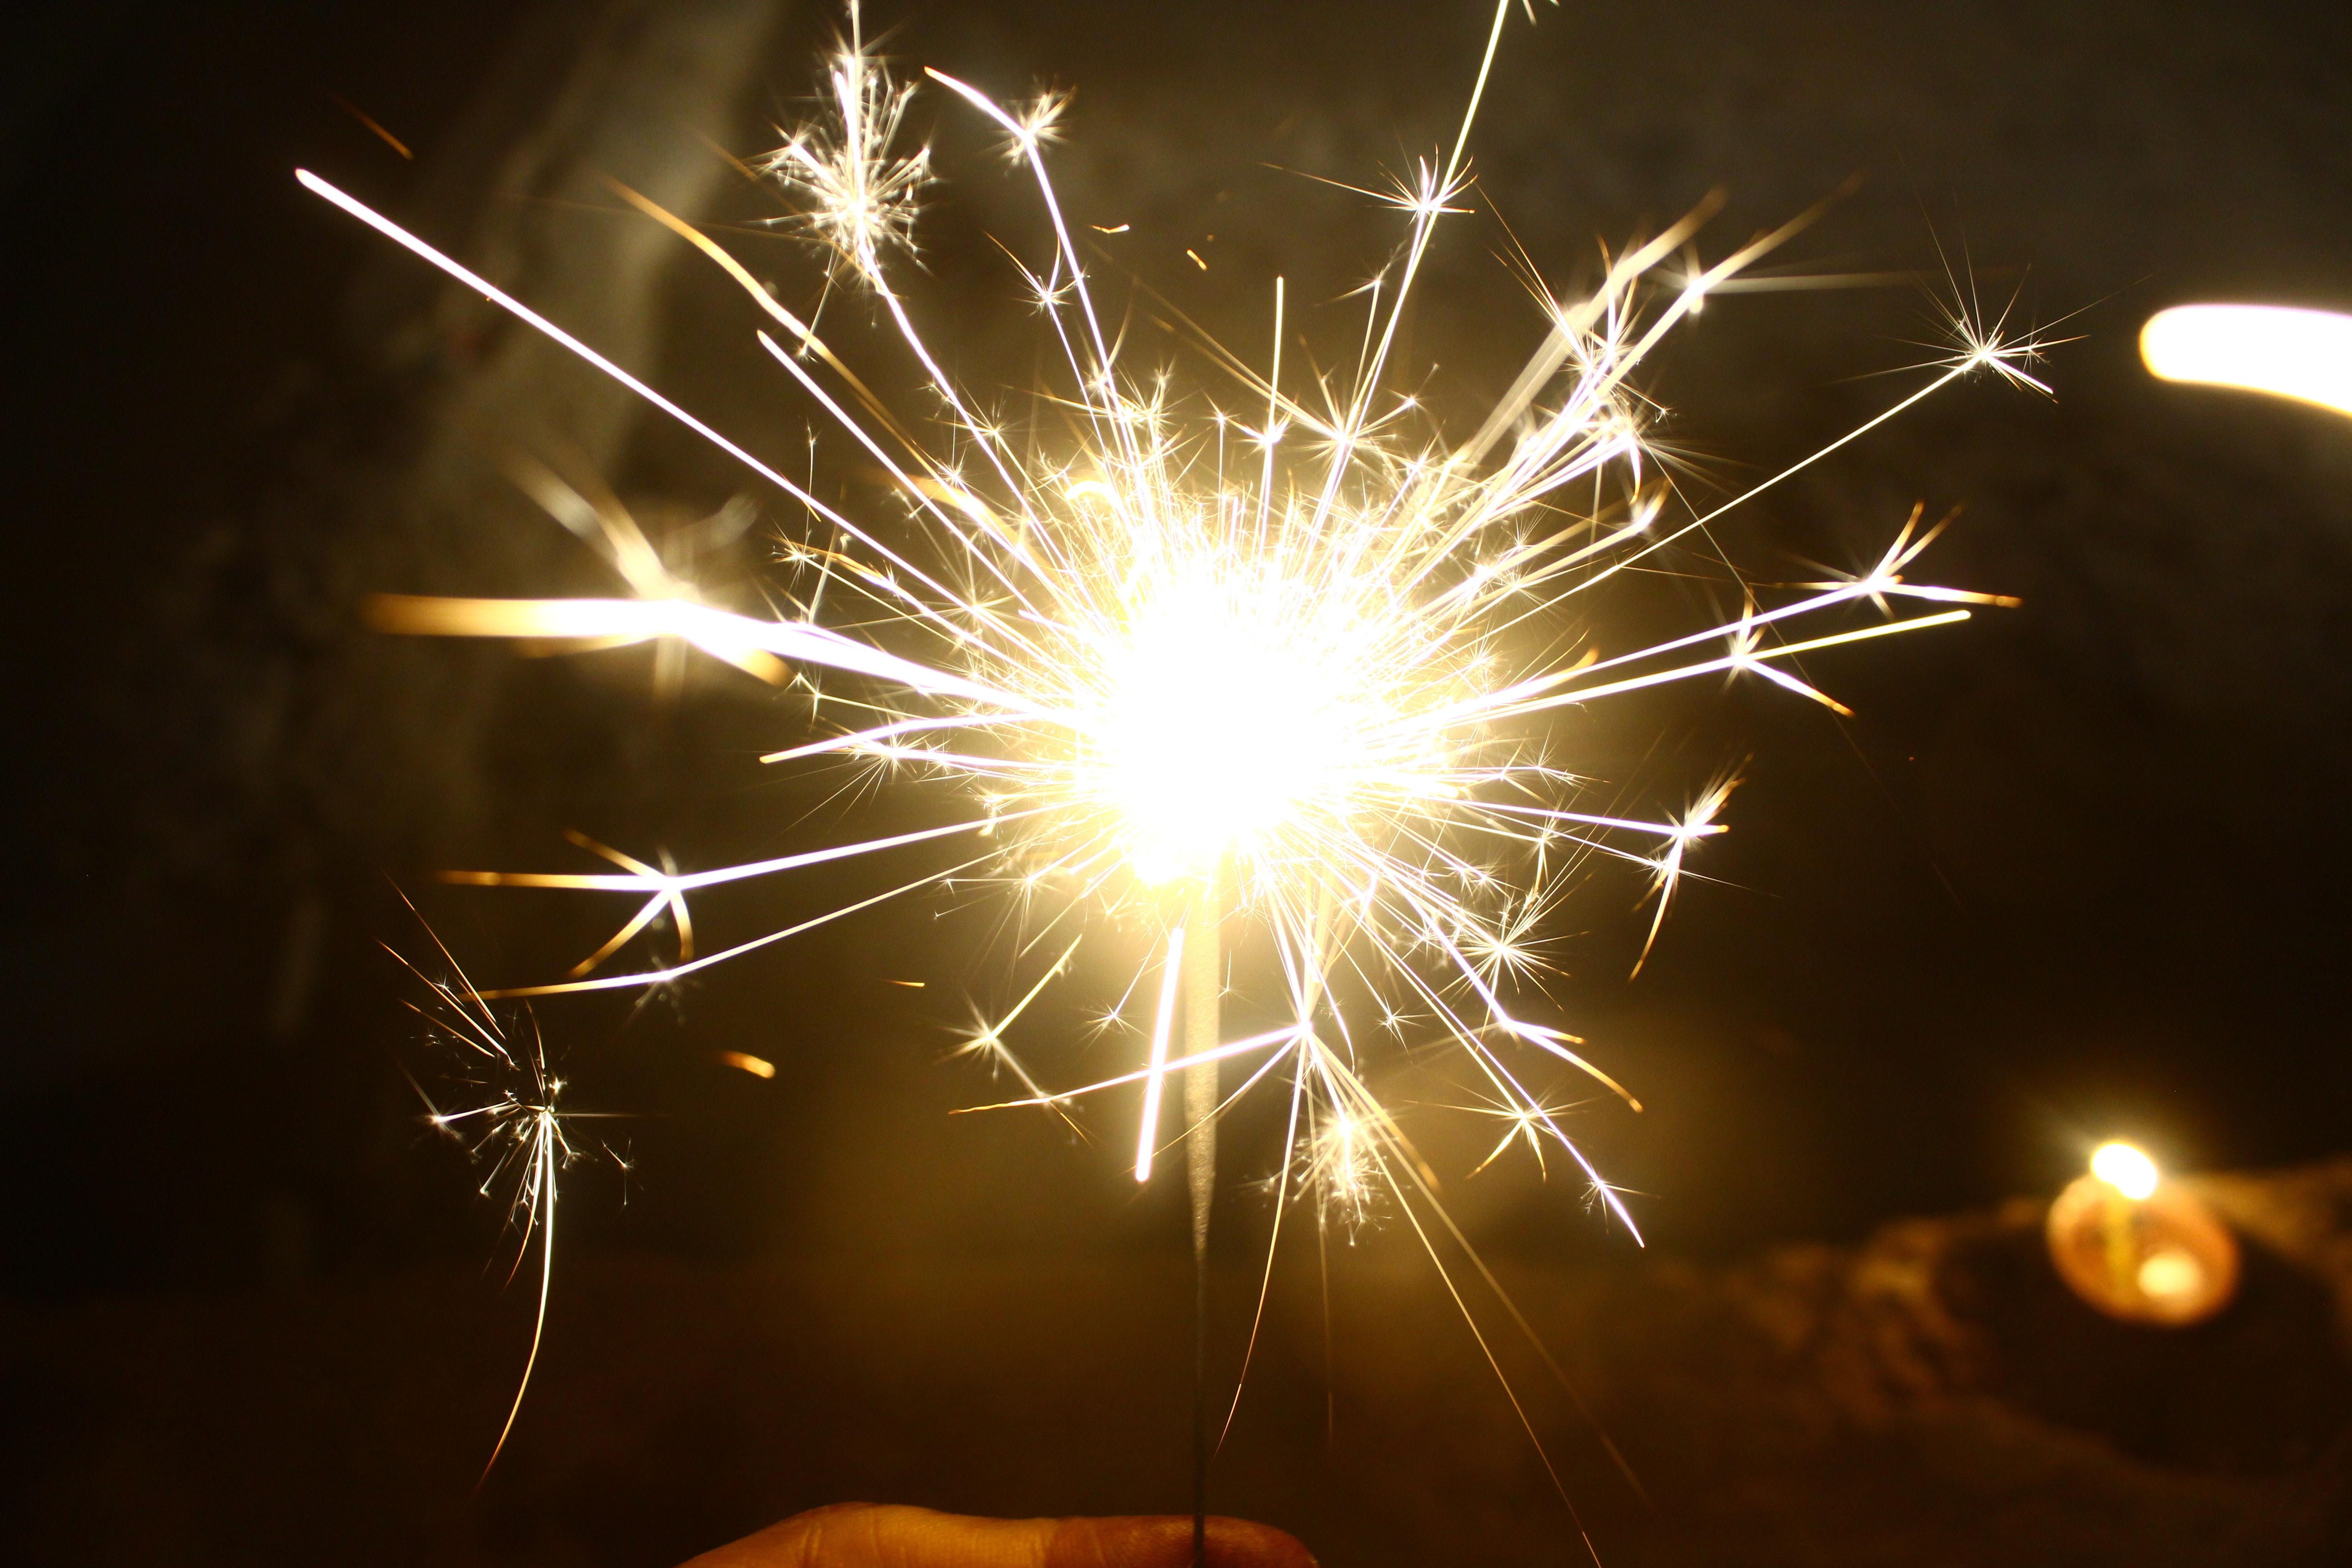 bright-celebration-close-up-1591294.jpg